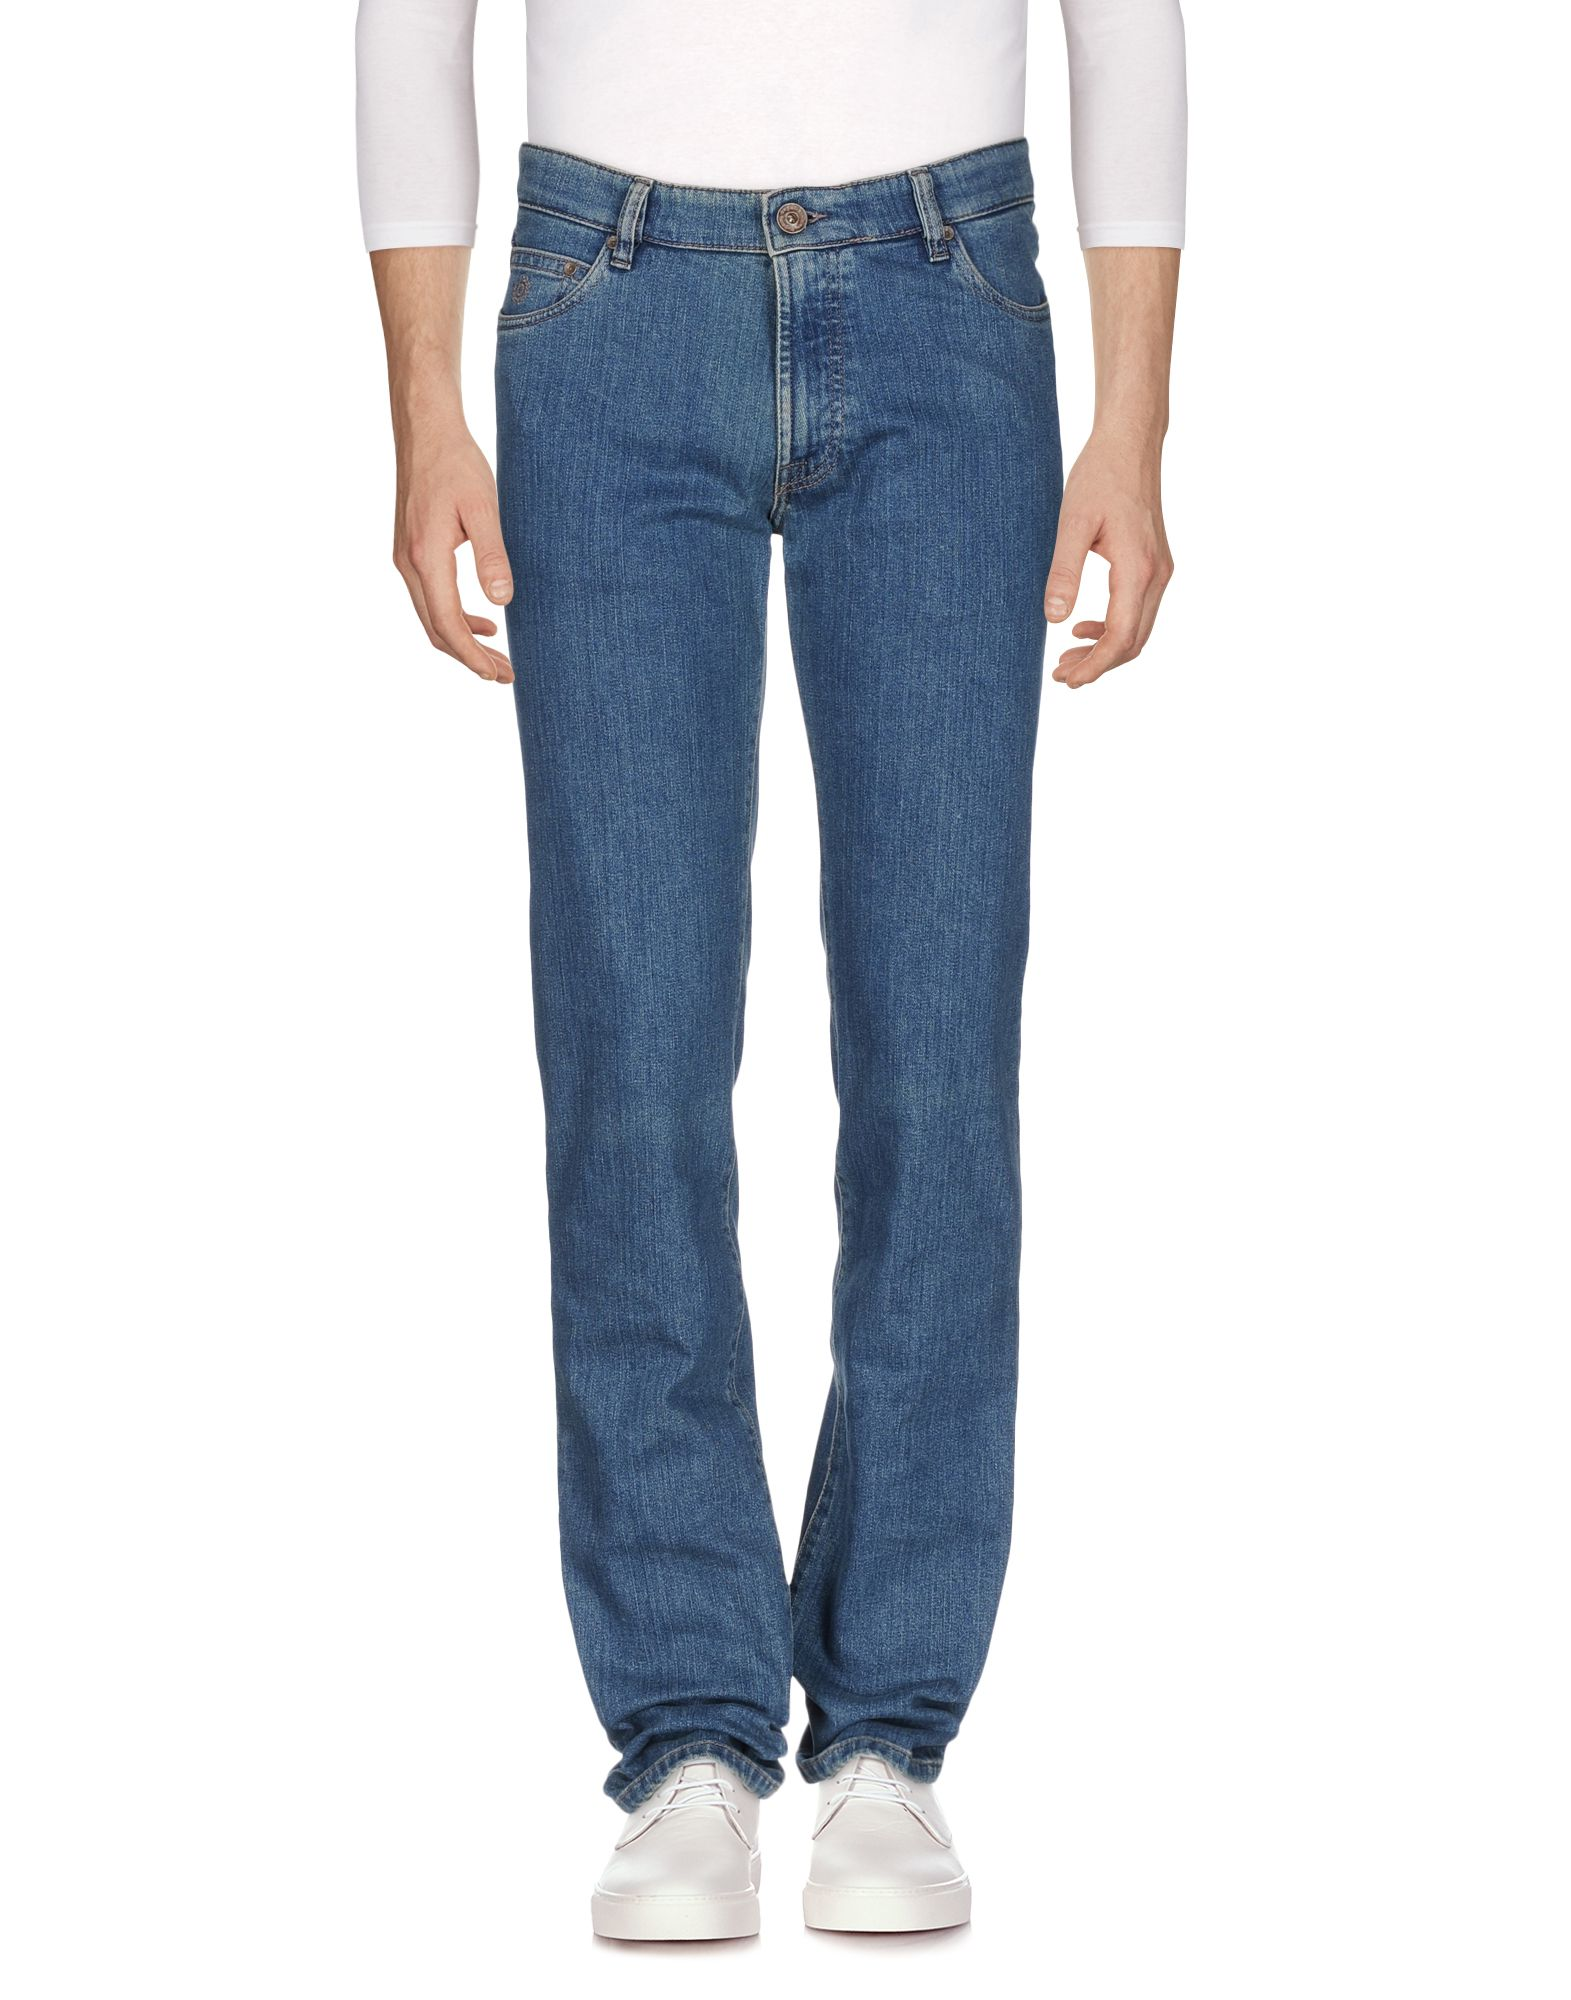 ФОТО bugatti джинсовые брюки